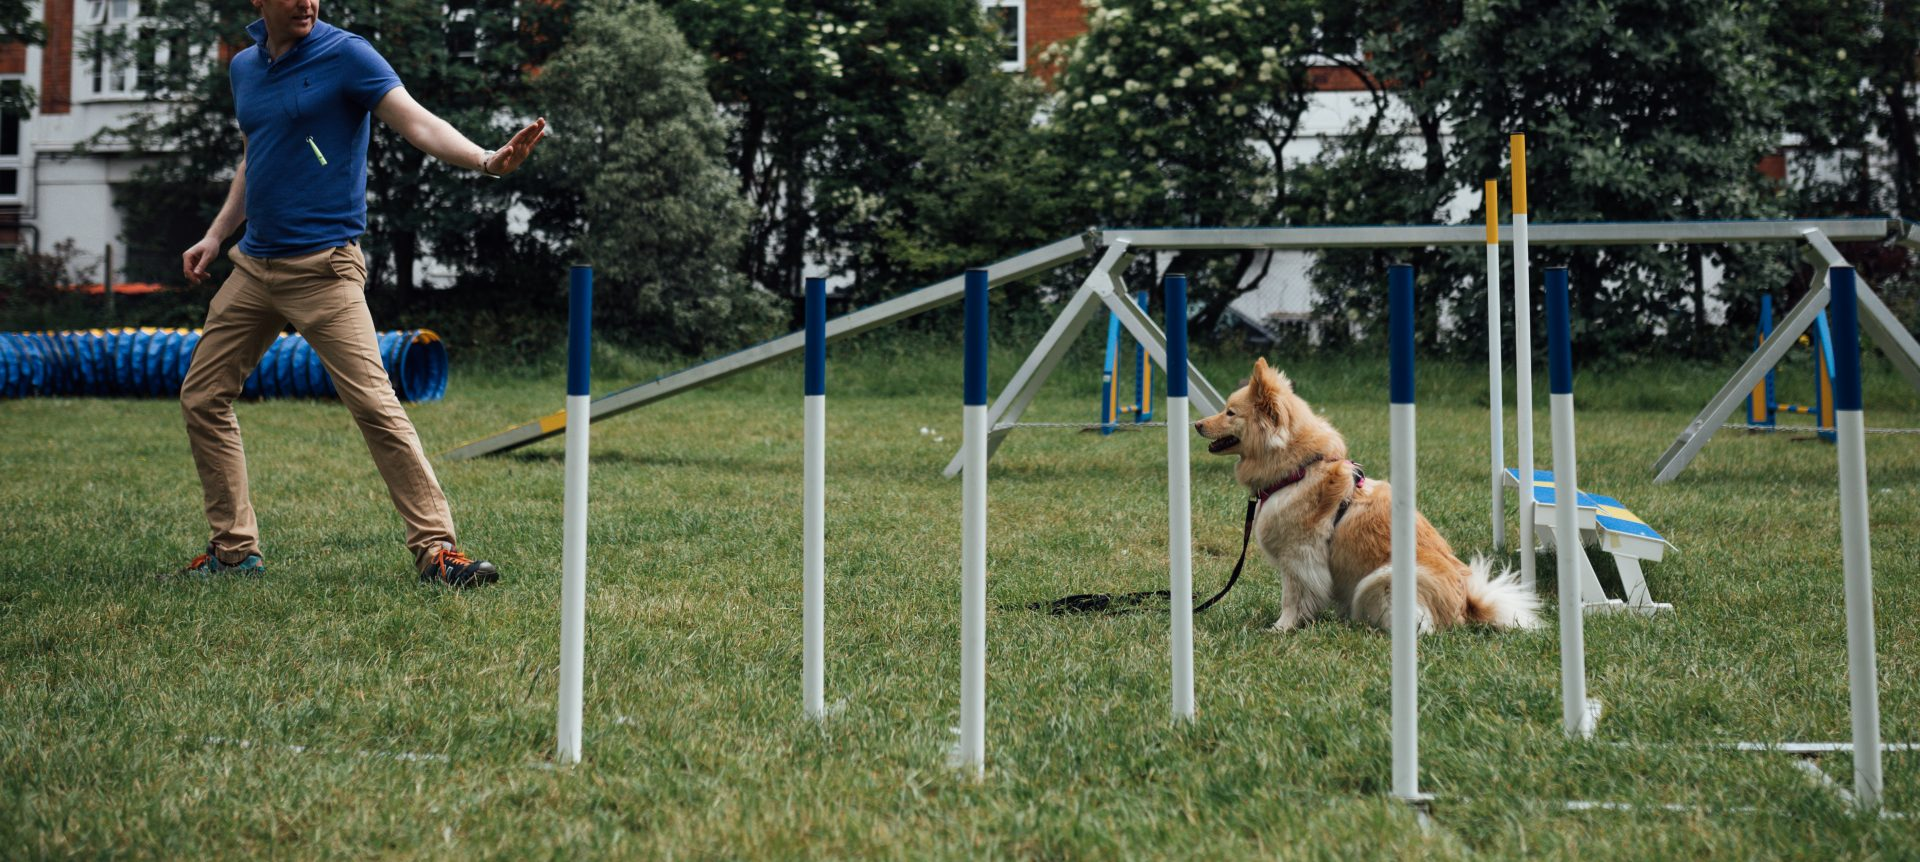 Best Puppy Training Classes Near Me In Northern Ireland UK